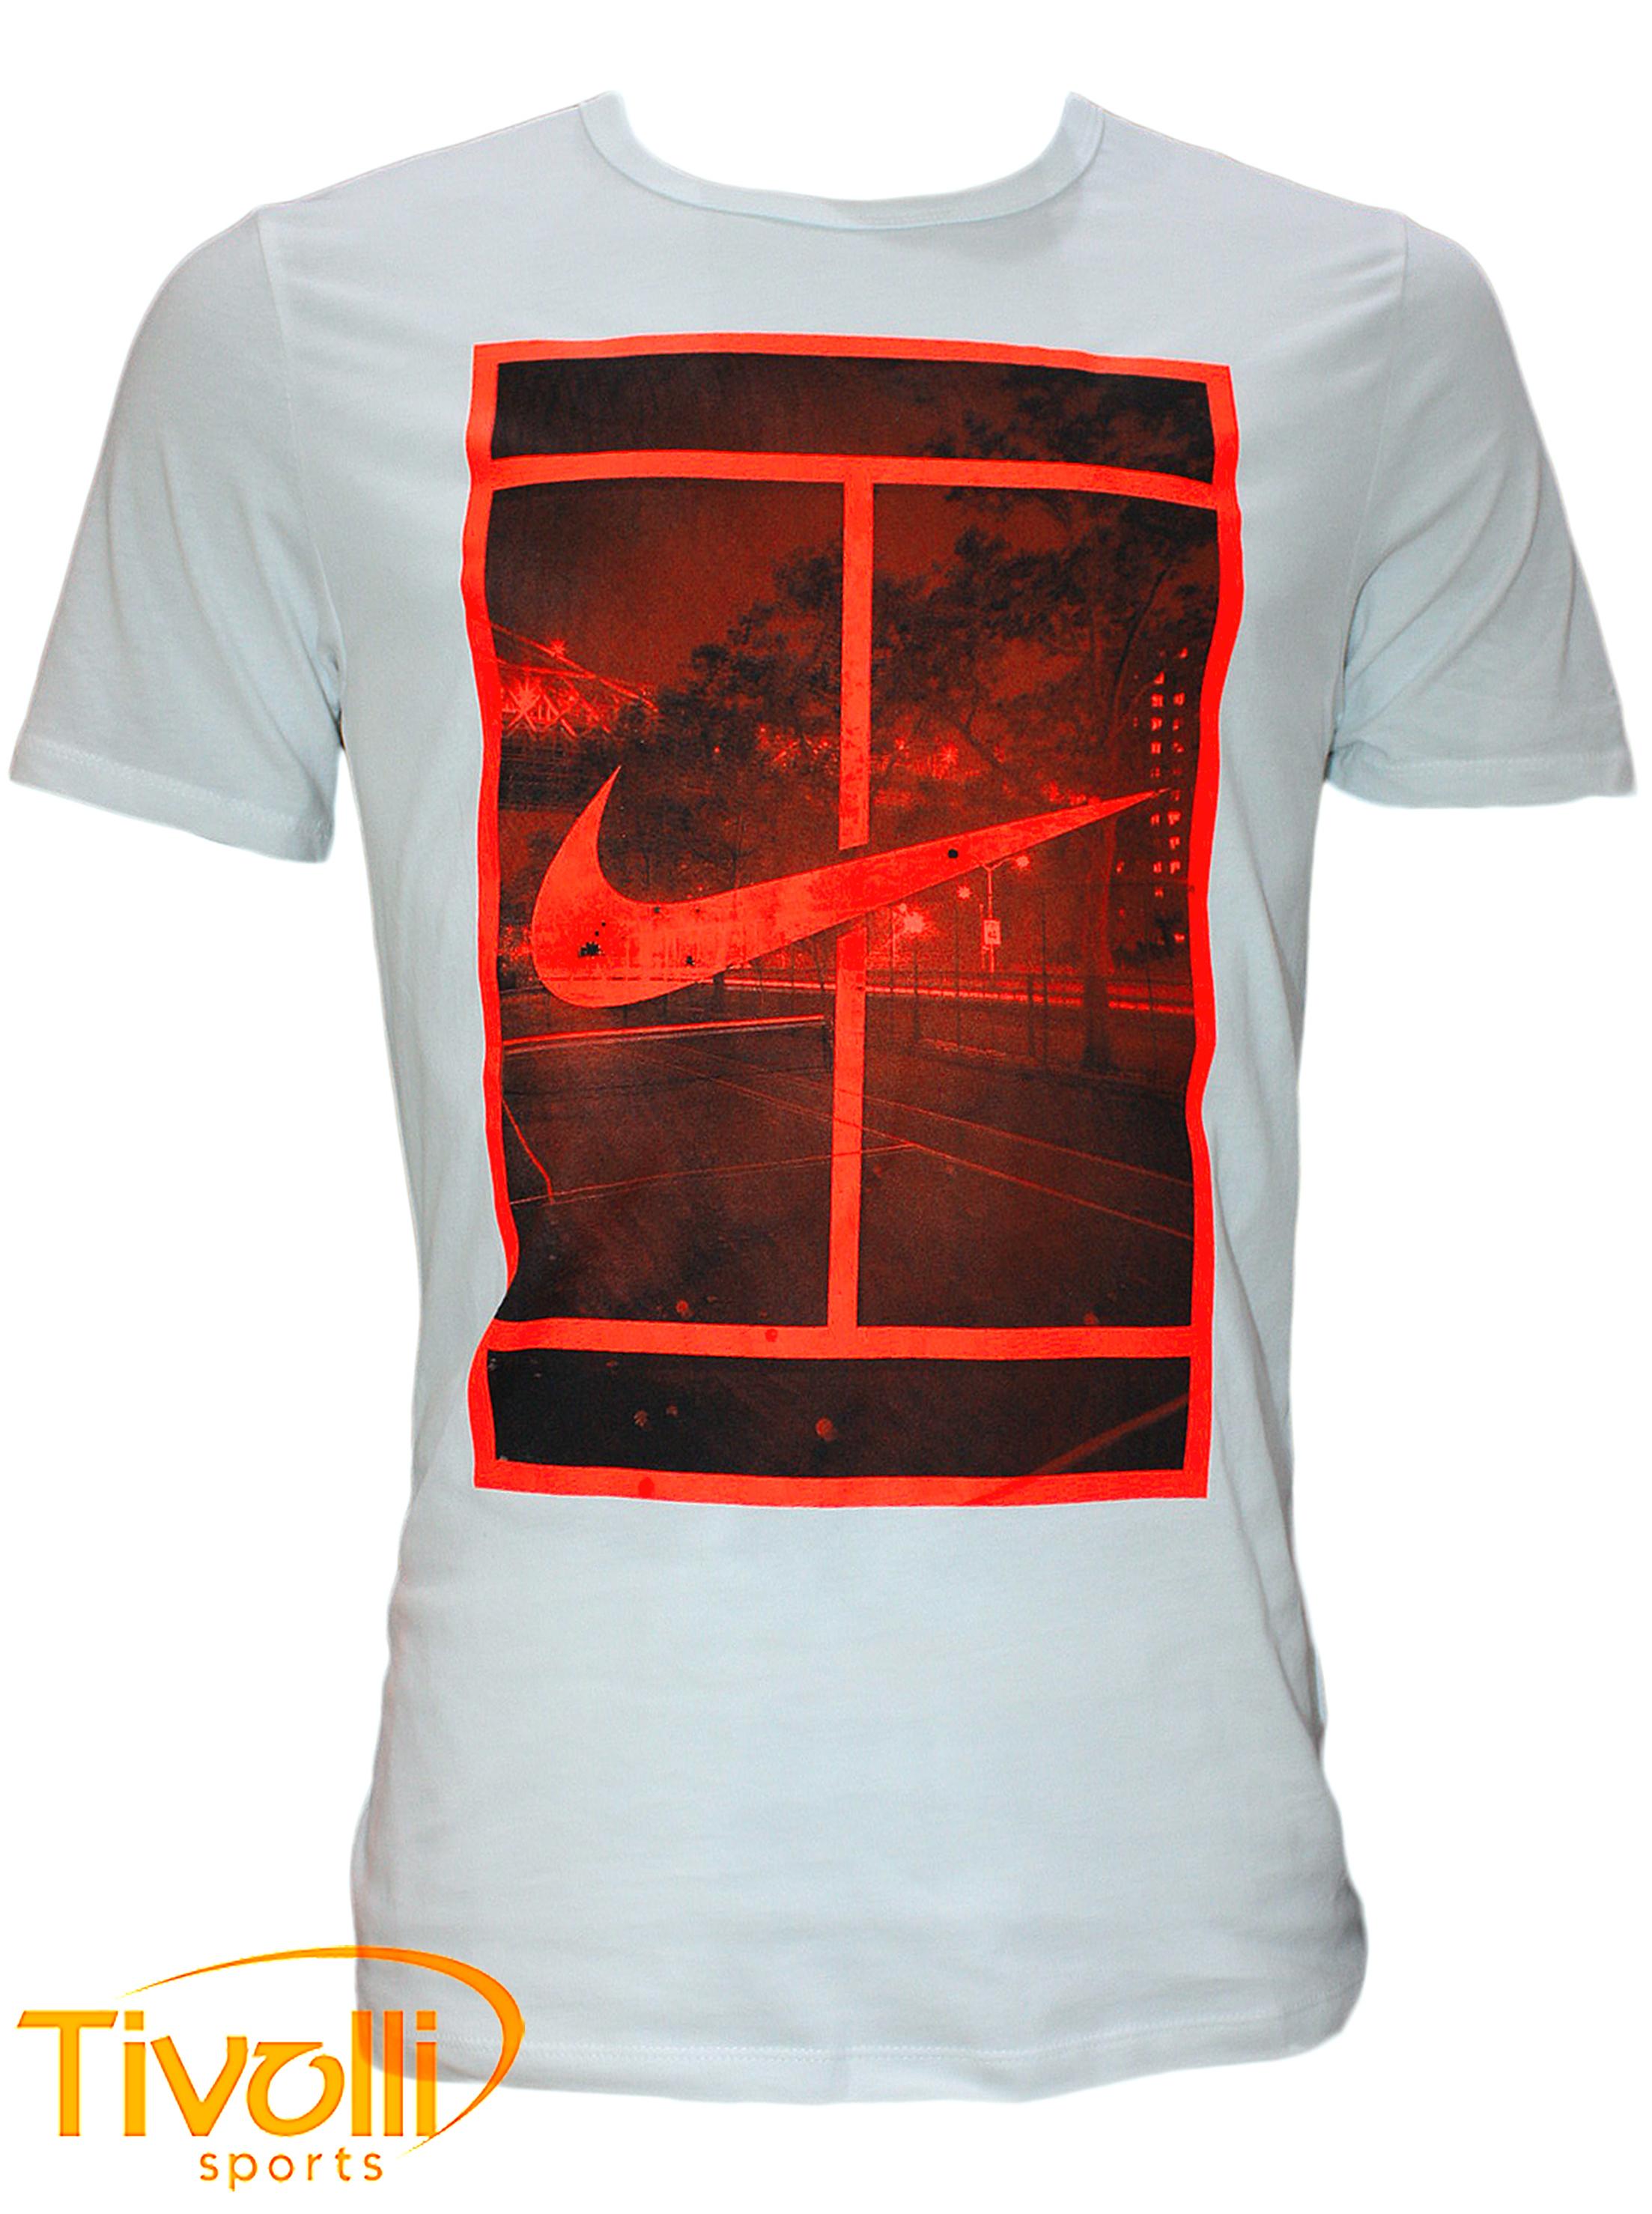 e8322667624 Camiseta Nike Court Branca com Estampa - Roger Federer - US Open 2015